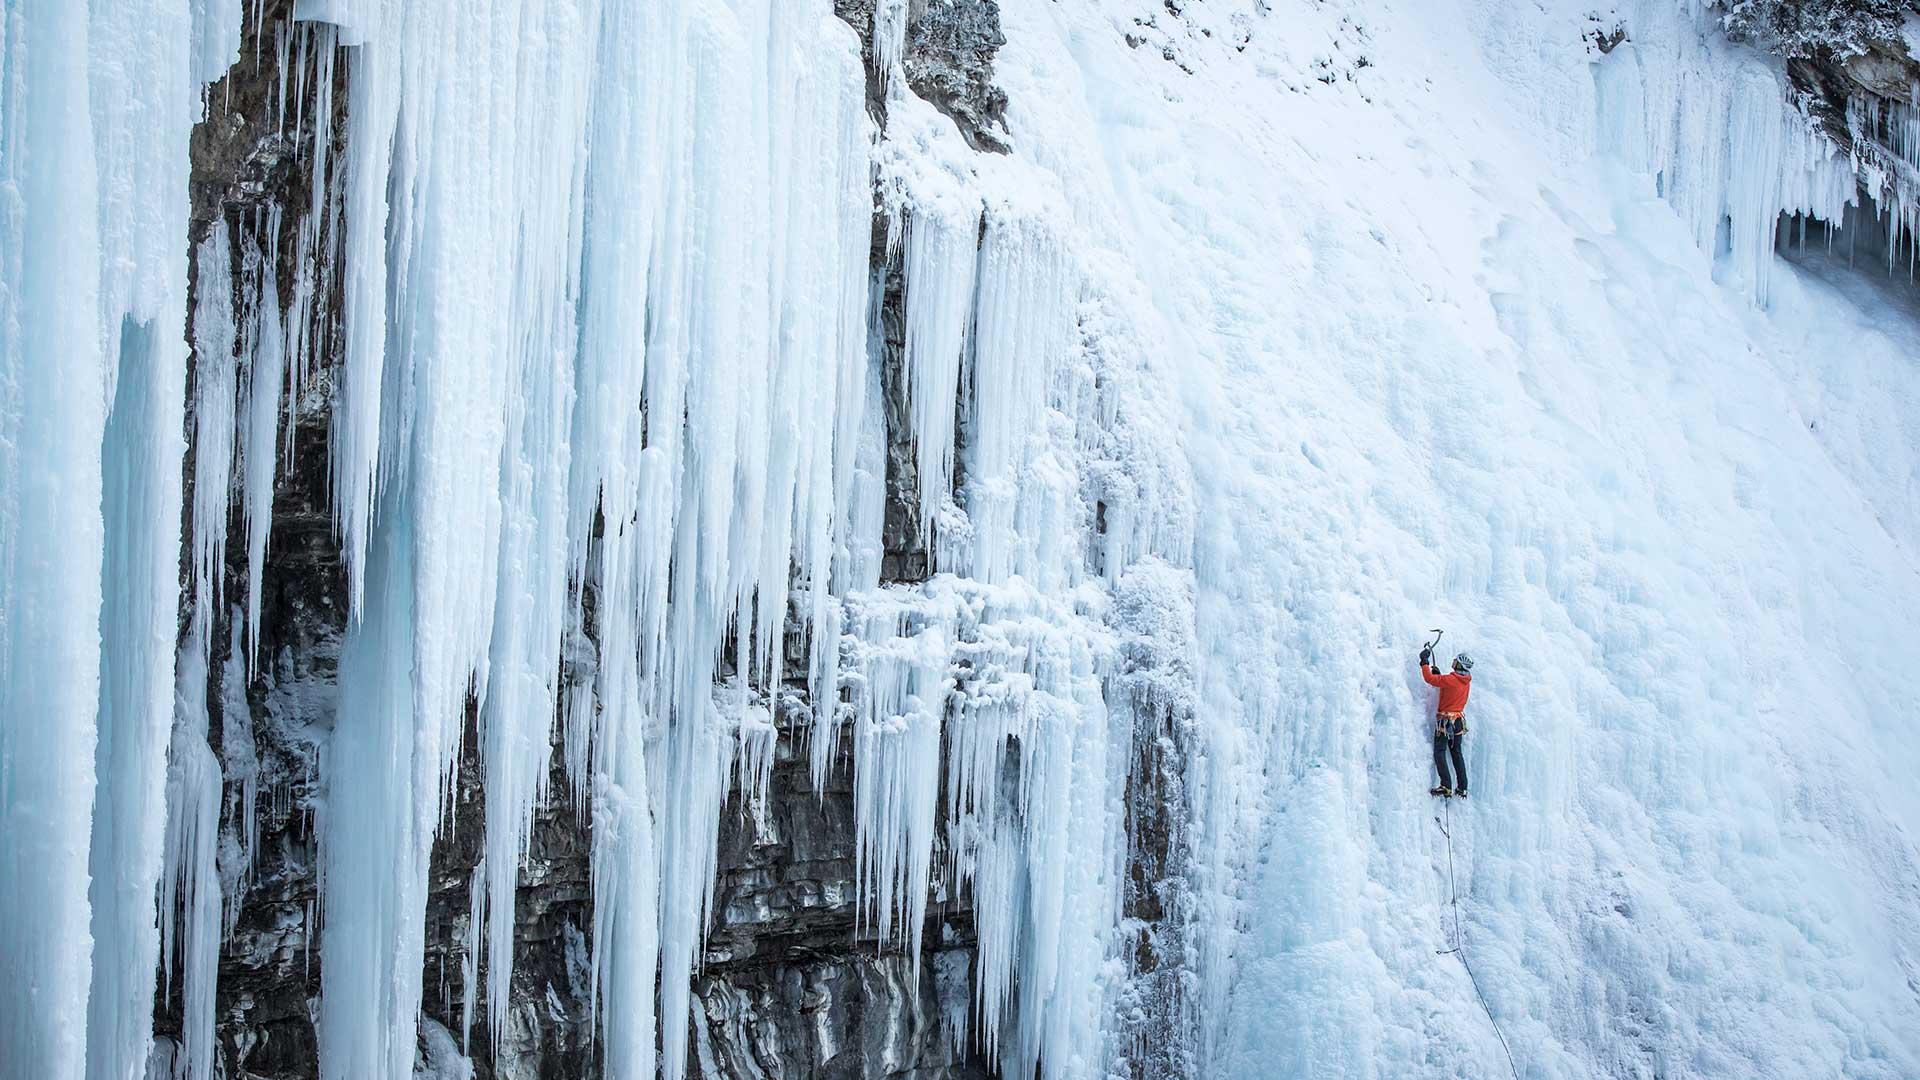 Winter Ice Climbing Johnson Canyon, Banff National Park